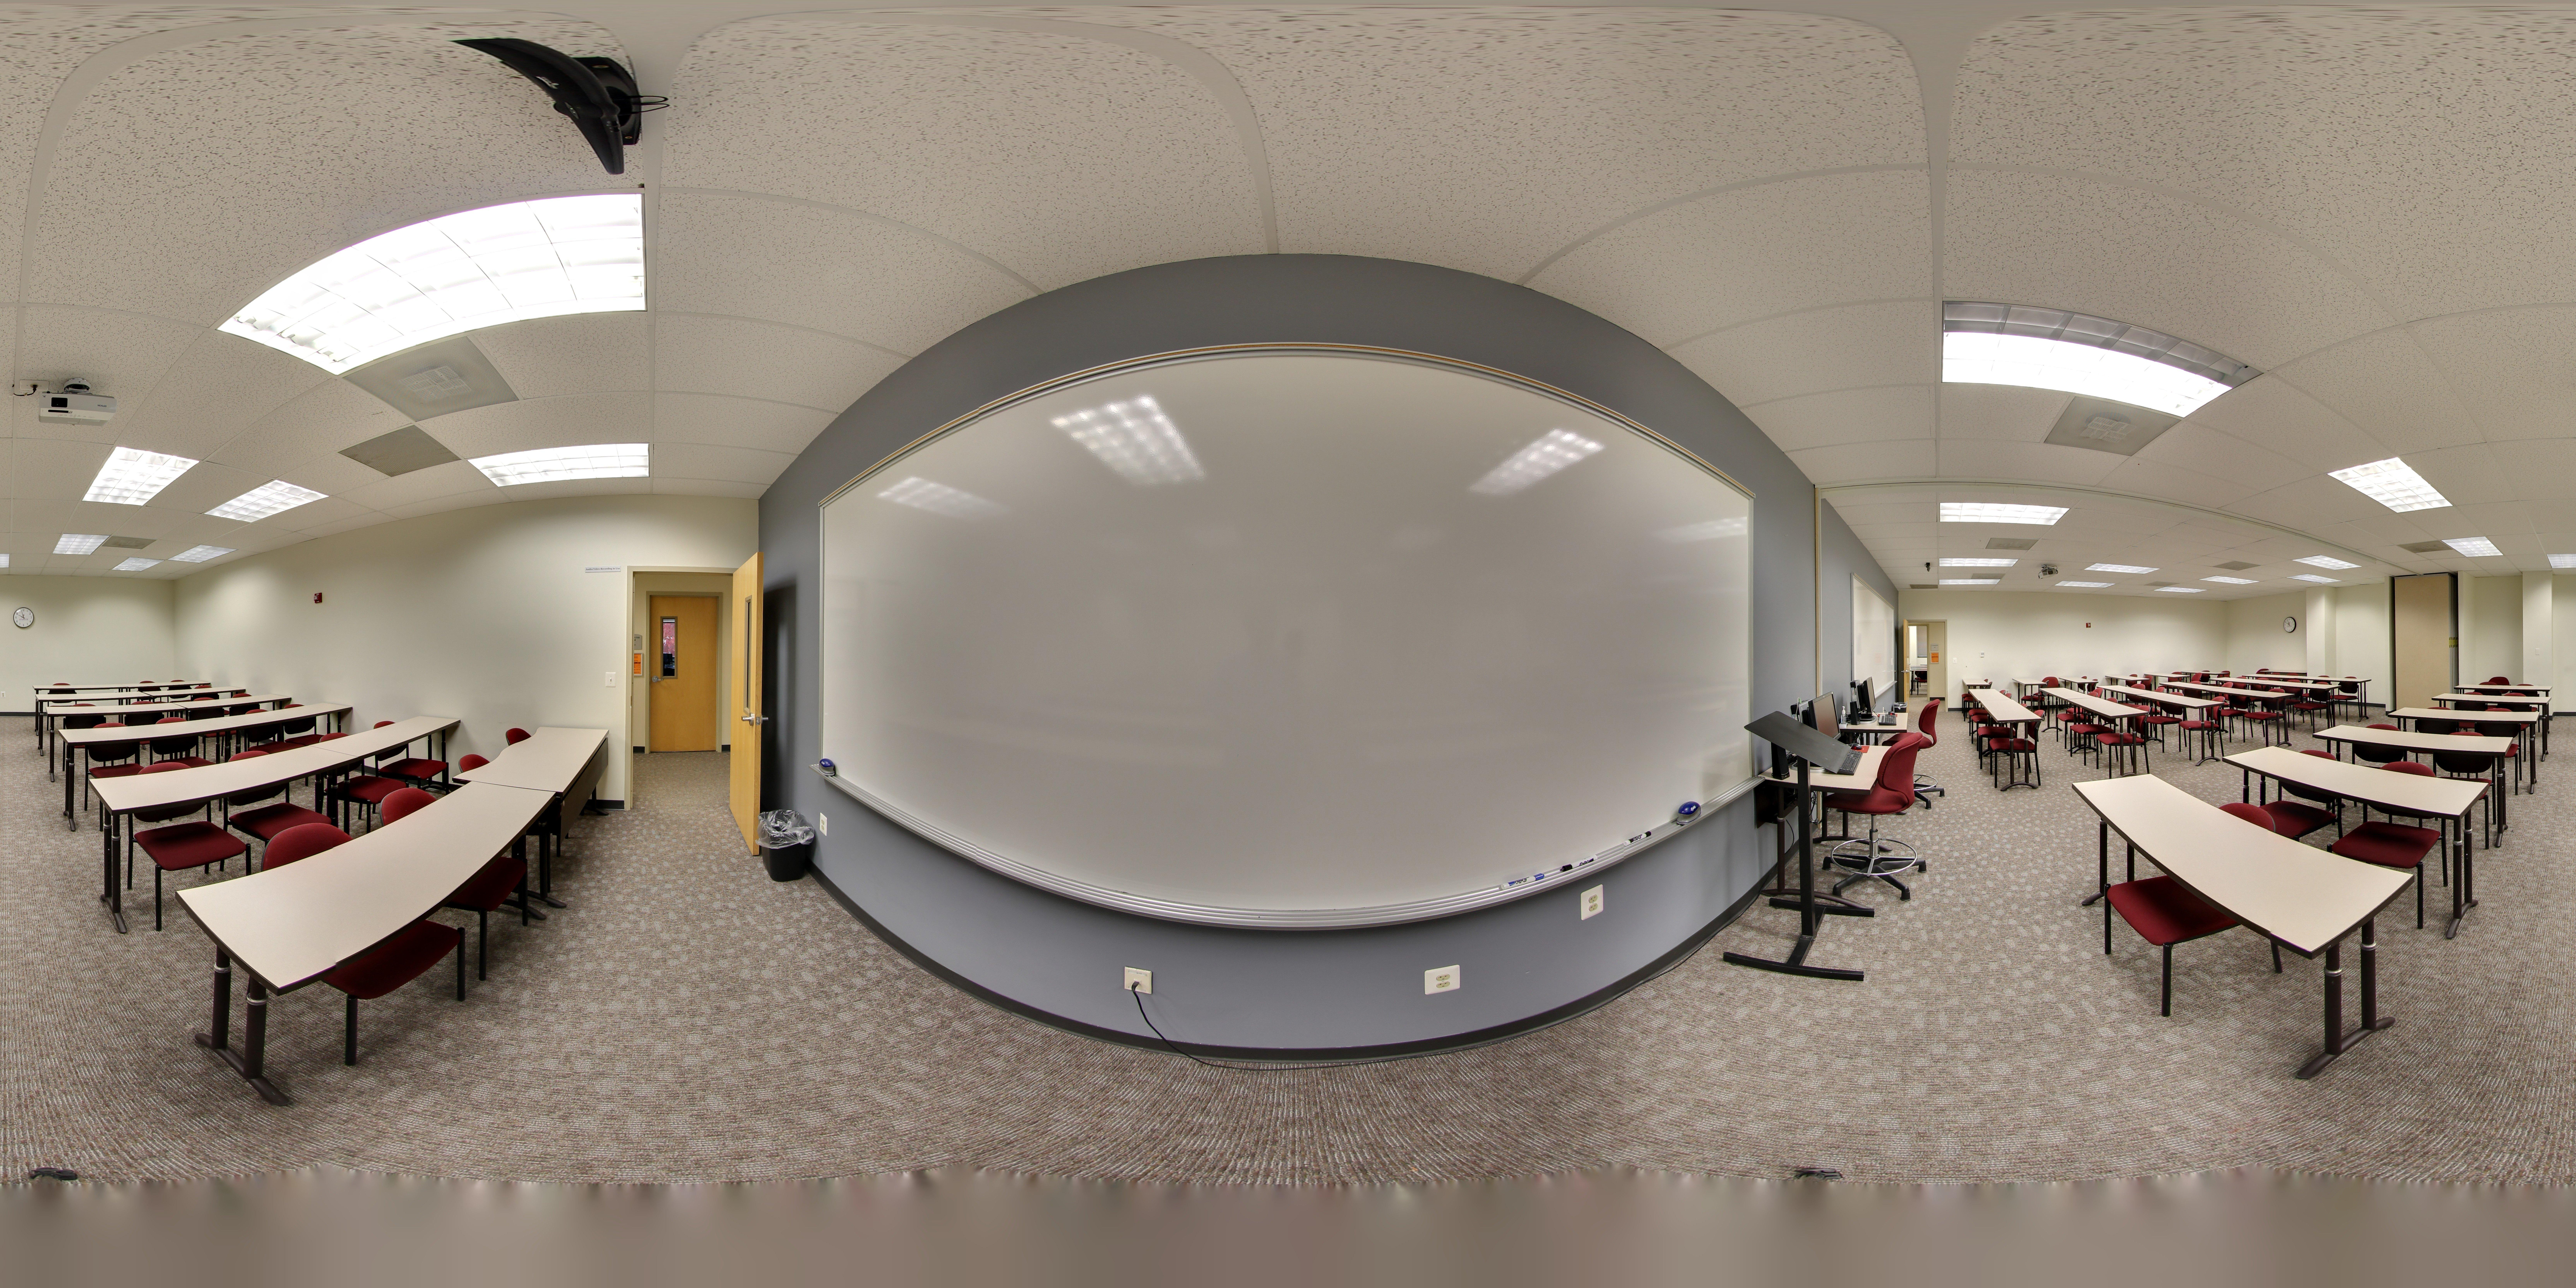 Strayer University image 48